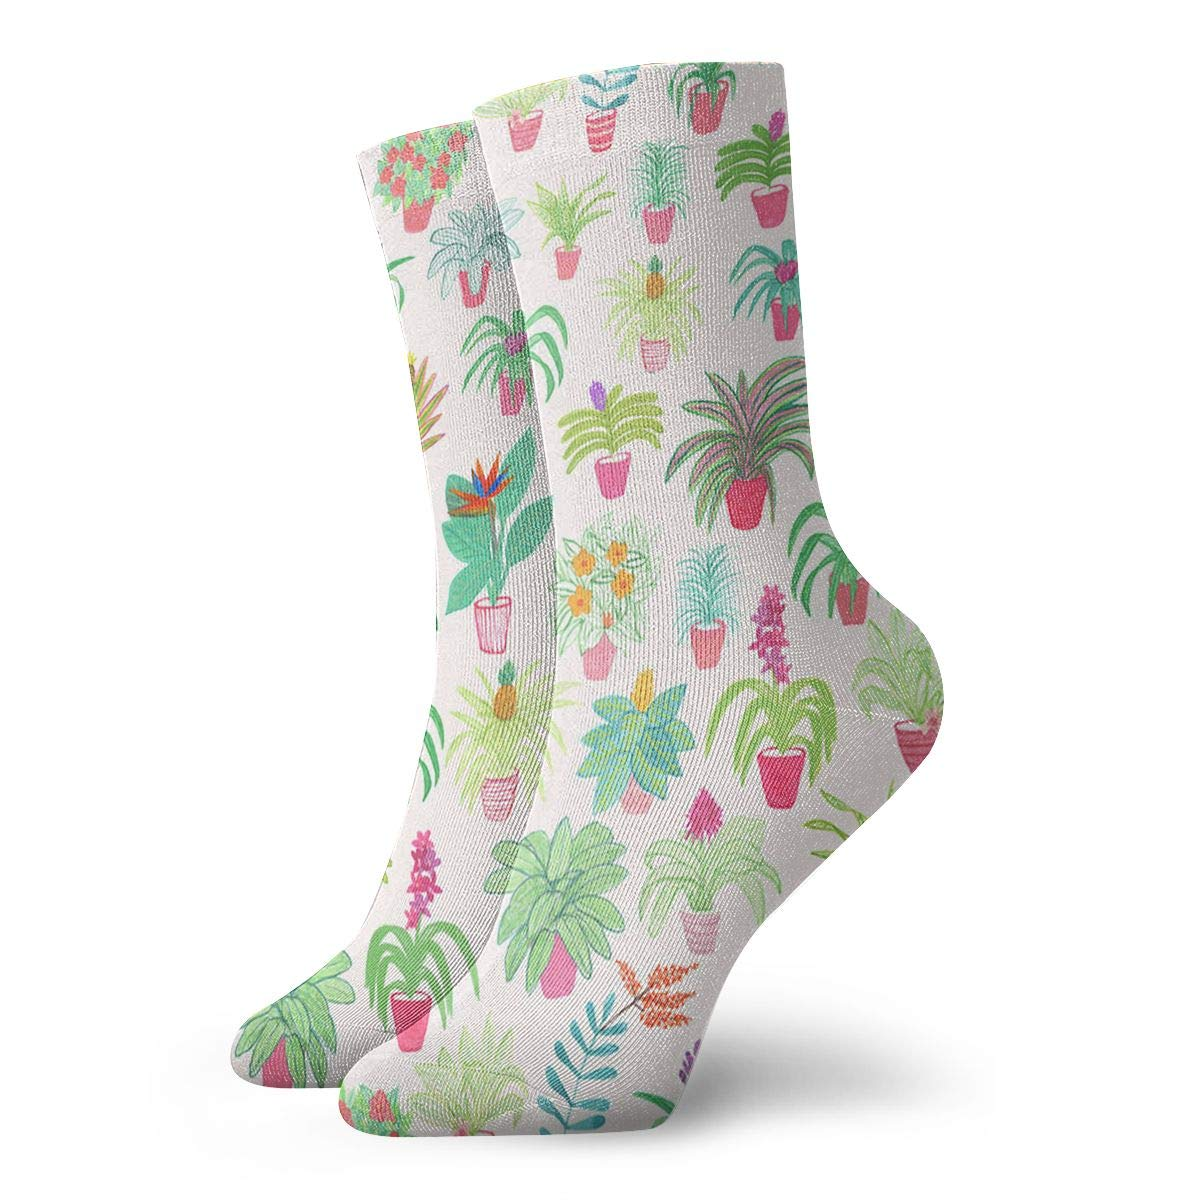 Pot Unisex Funny Casual Crew Socks Athletic Socks For Boys Girls Kids Teenagers